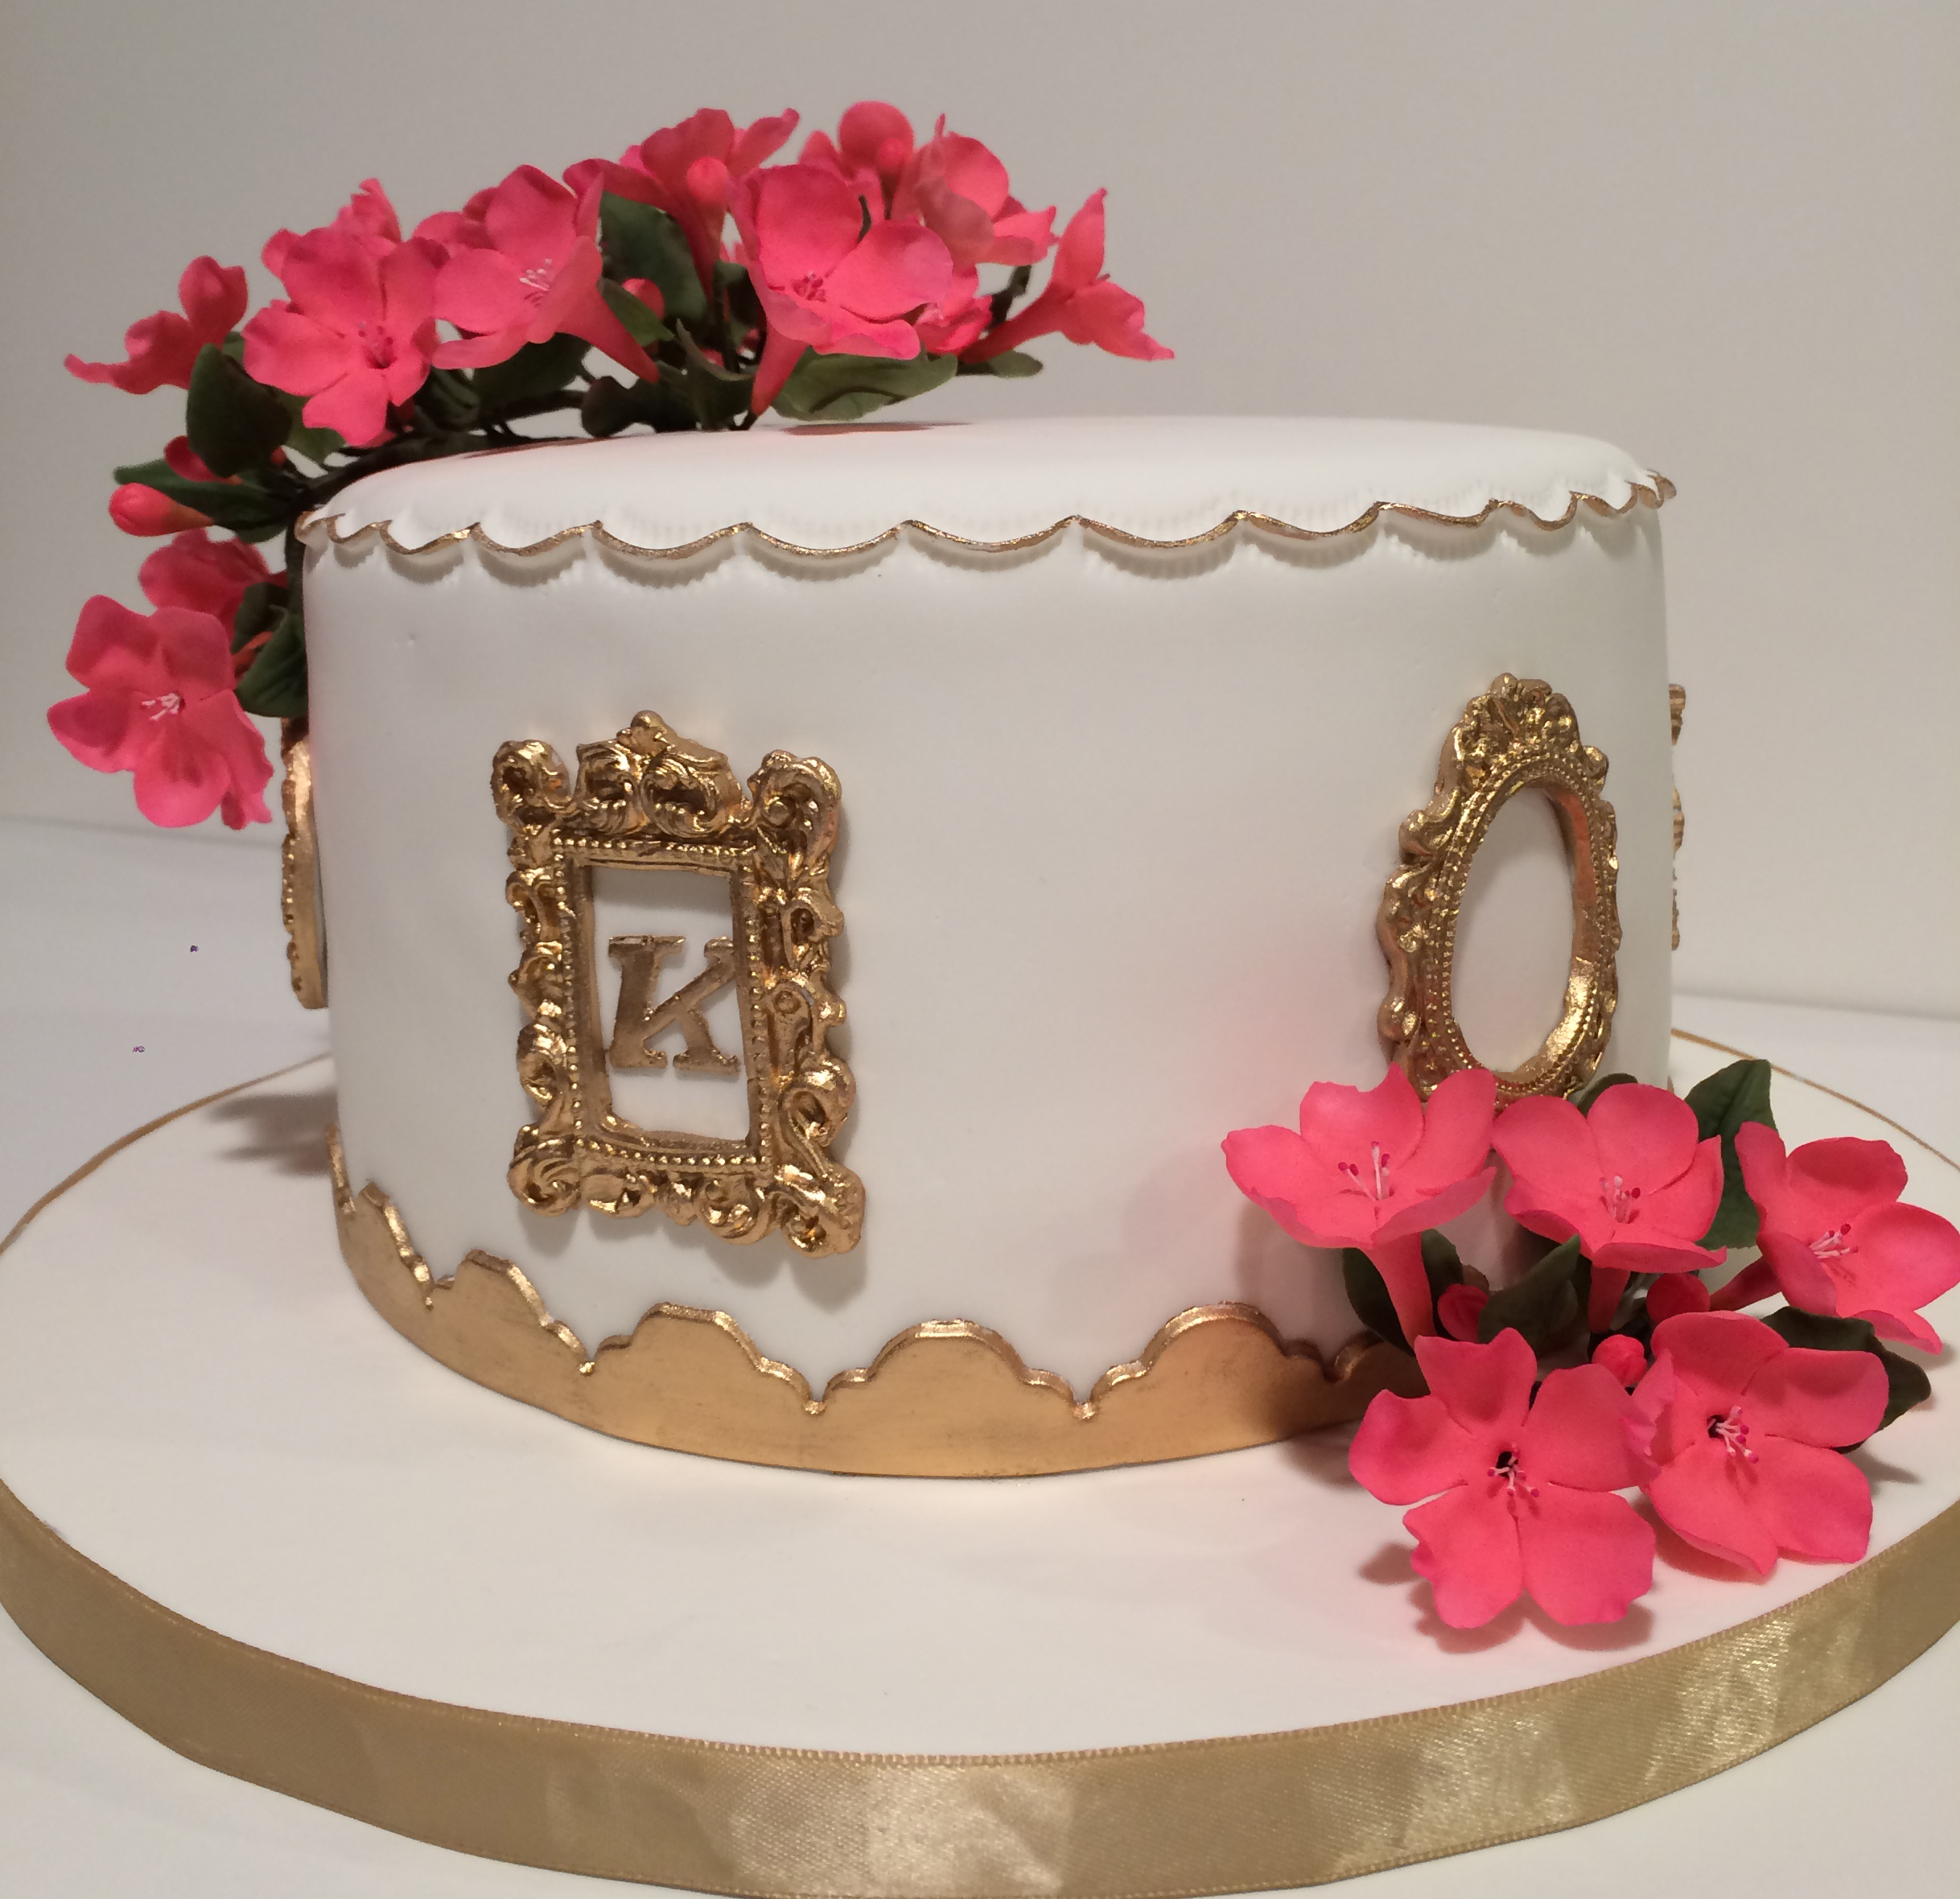 A framer's celebration cake